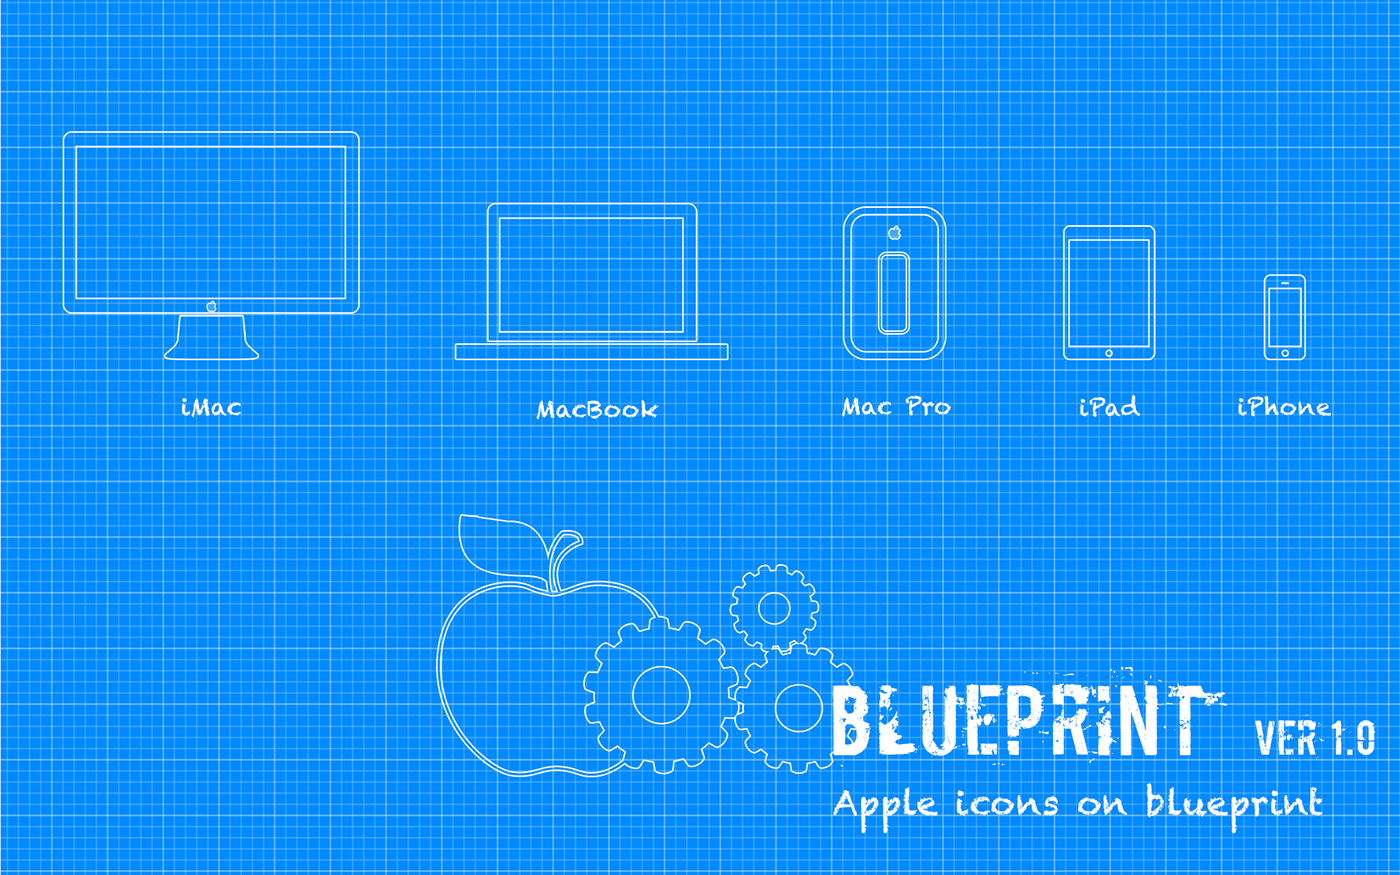 apple blueprint - photo #3